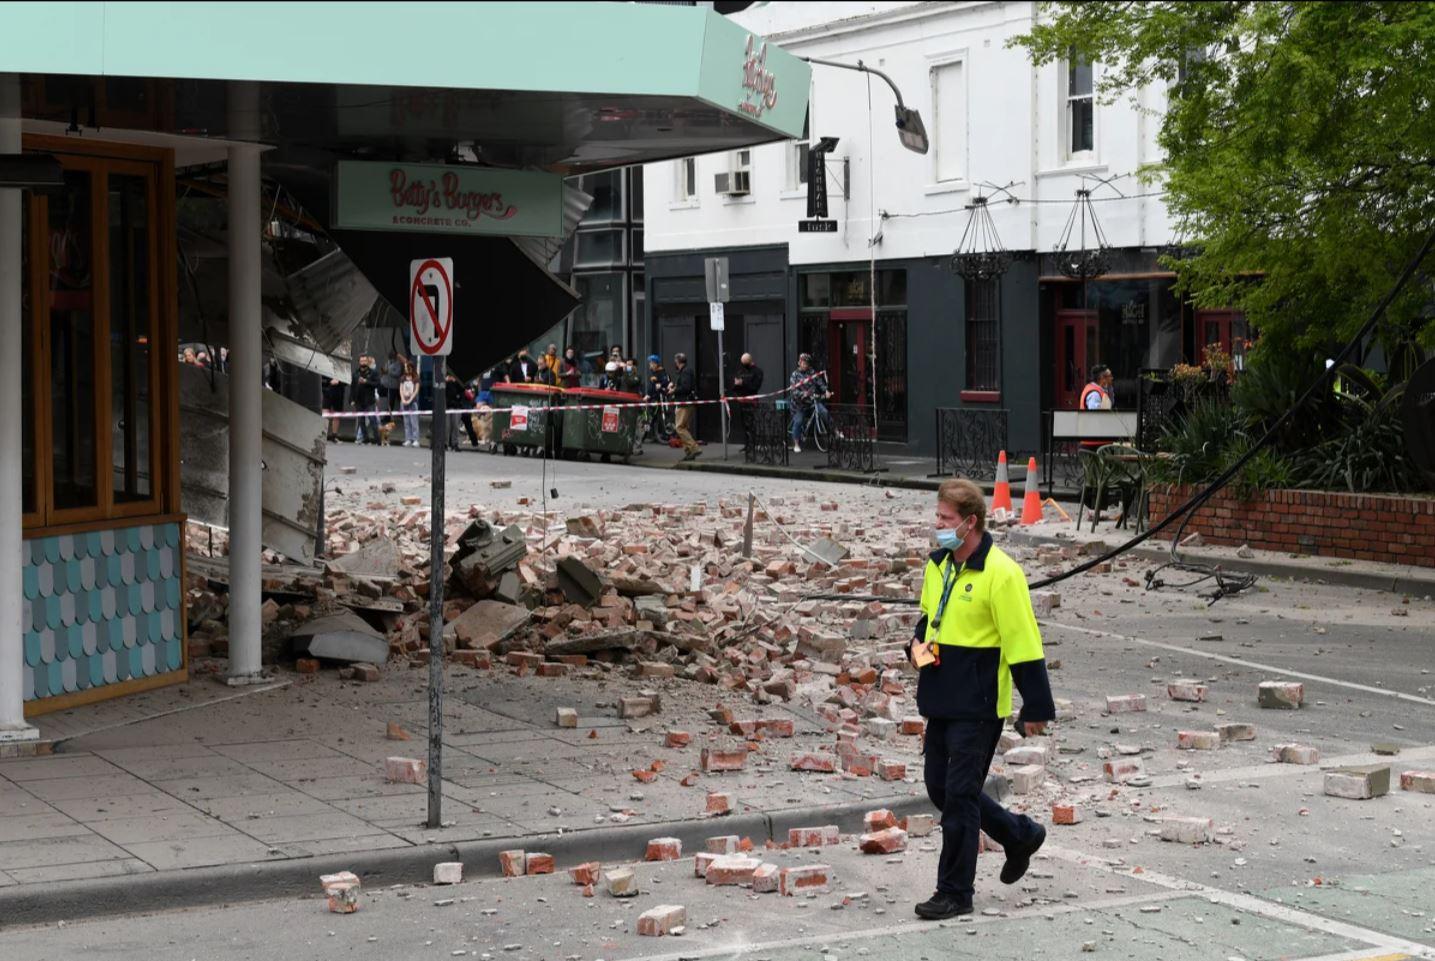 Zemljotres jačine 5,9 stepeni prema Richterovoj skali pogodio Melbourne, oštećene brojne zgrade